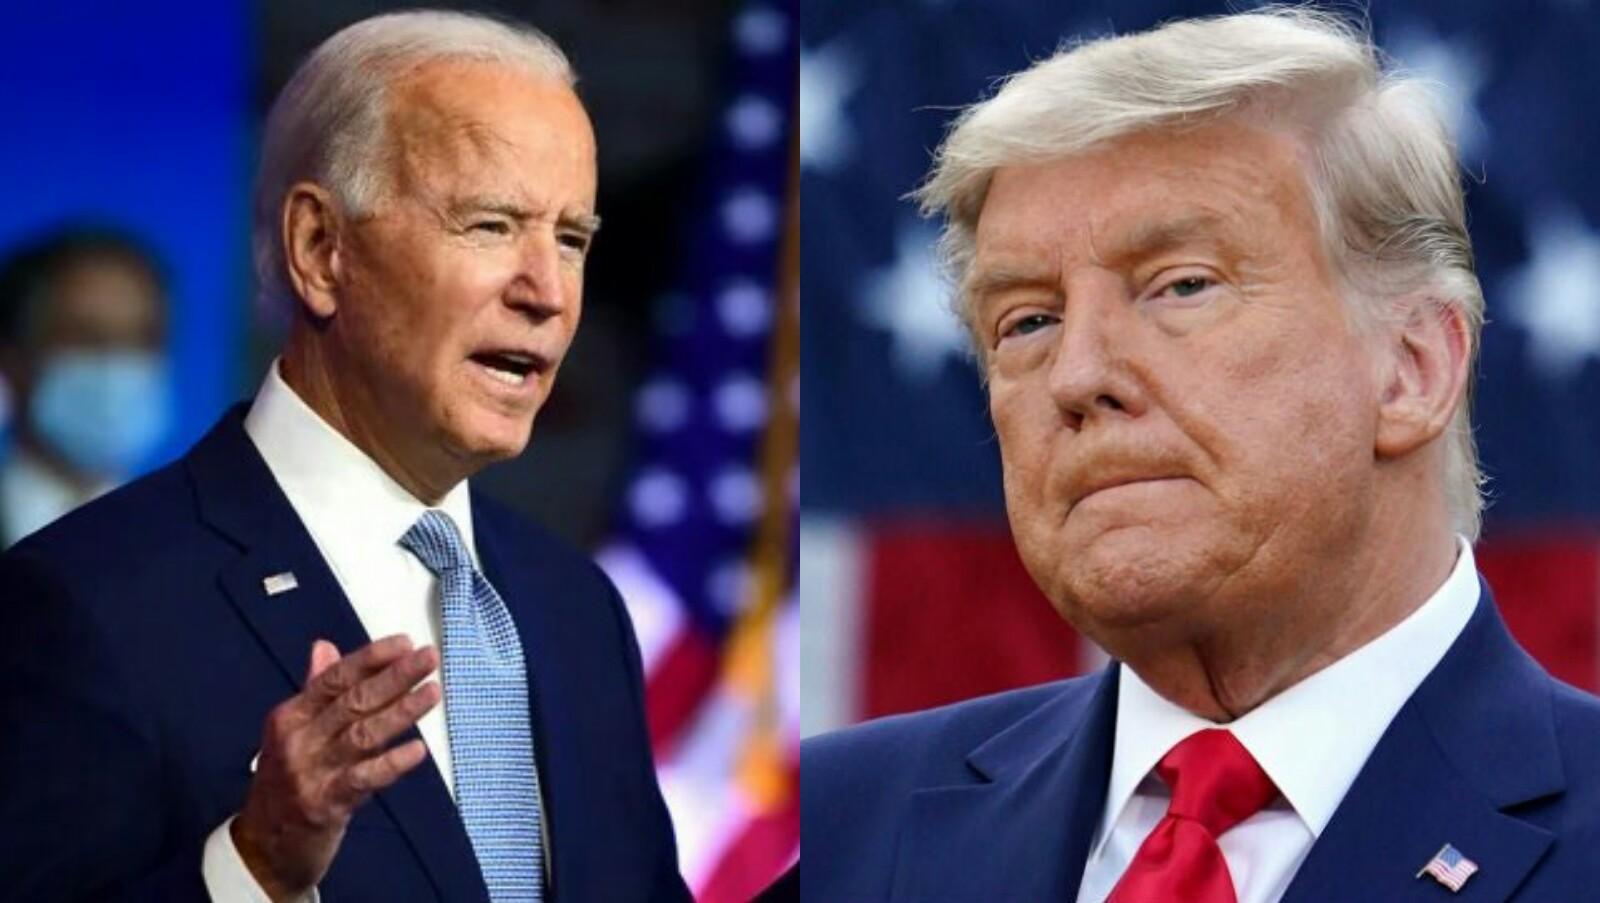 Joe Biden: Trump Needs to Sign COVID-19 Bill Into Law Now'